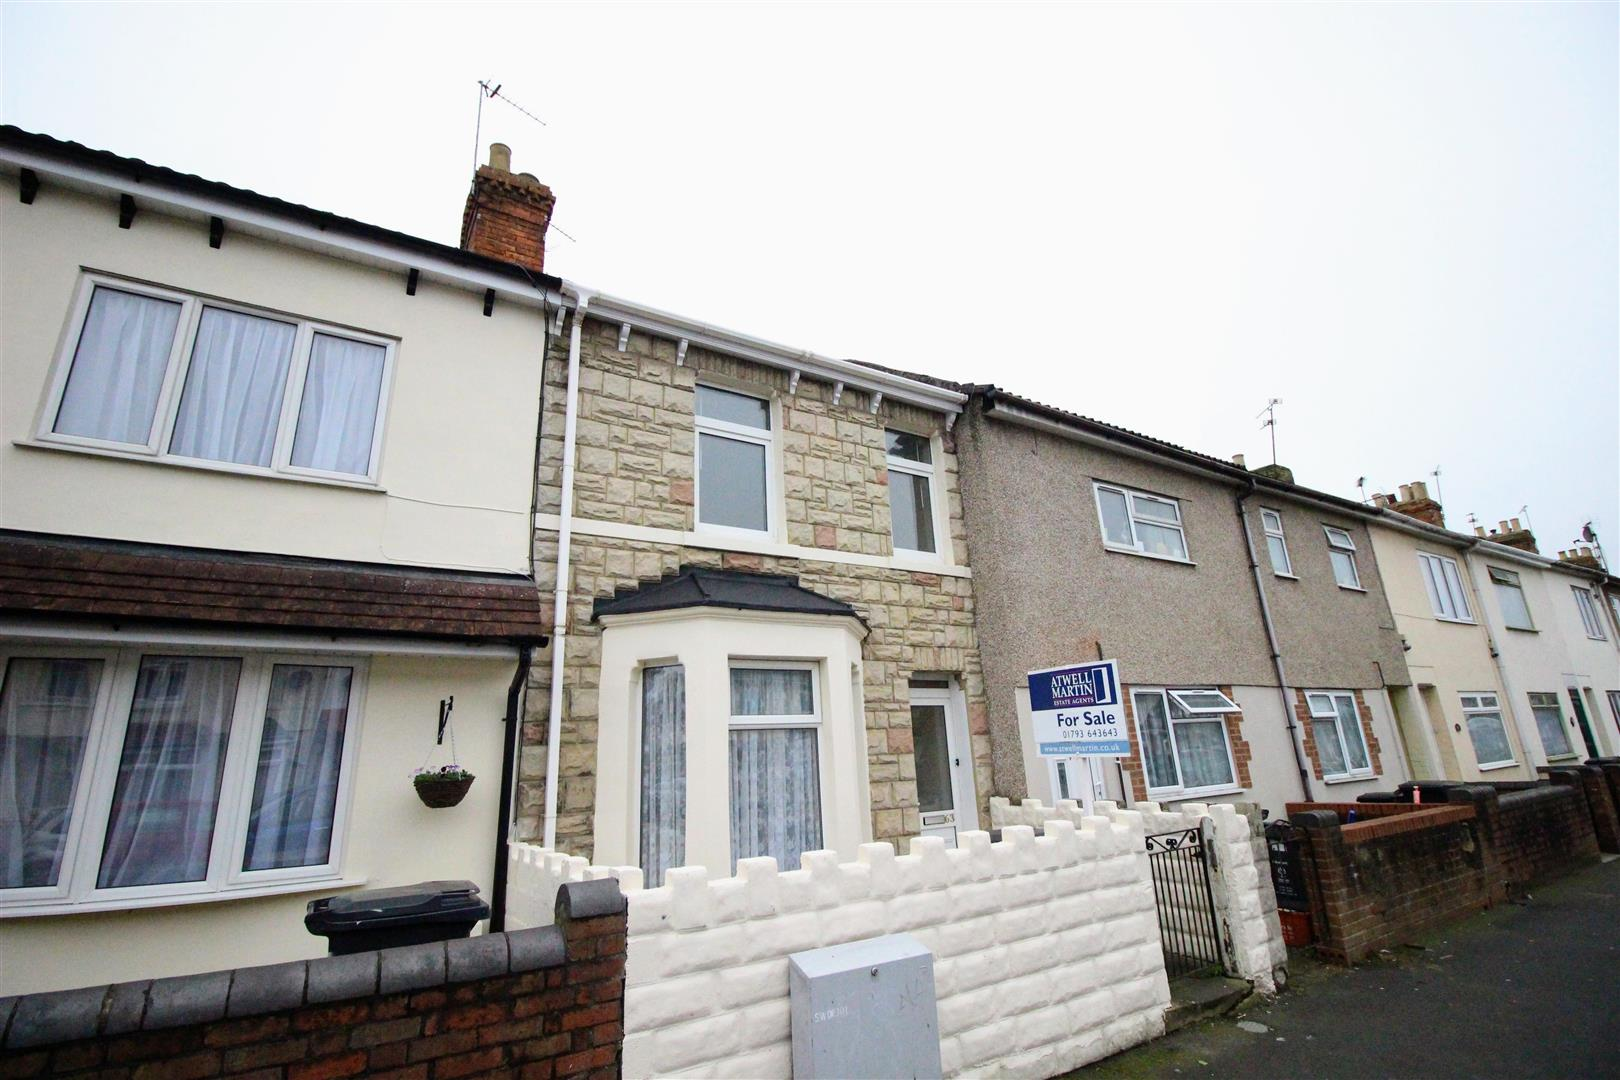 3 Bedrooms Terraced House for sale in Ferndale Road, Gorse Hill, Swindon